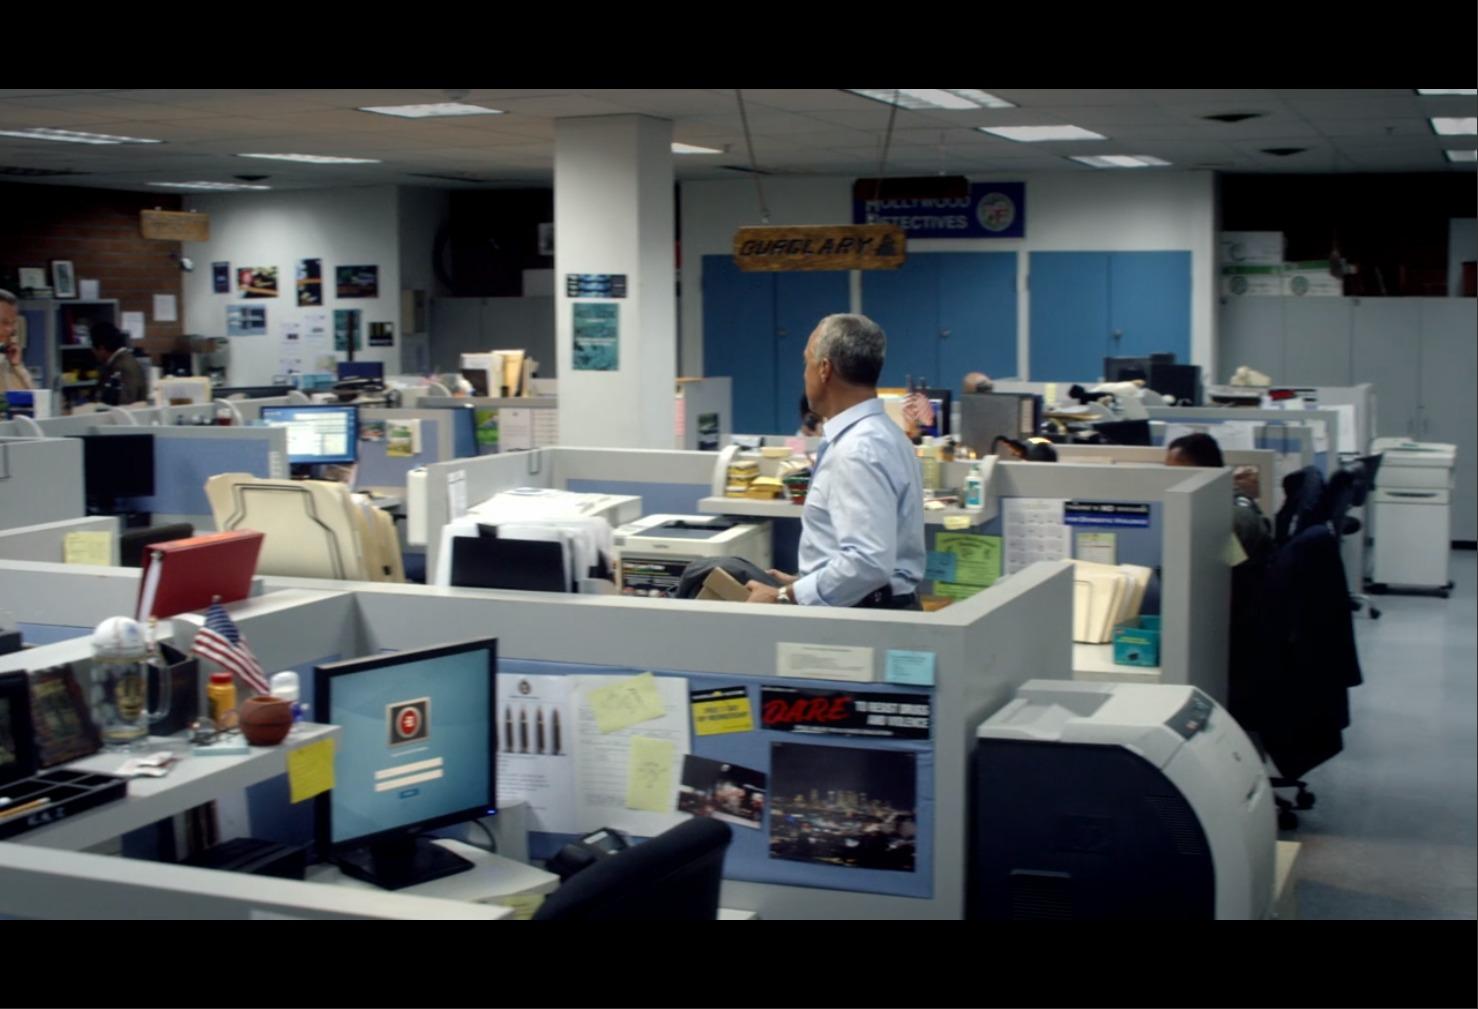 AmazonプライムビデオBOSCH警察署内のオフィスの画像